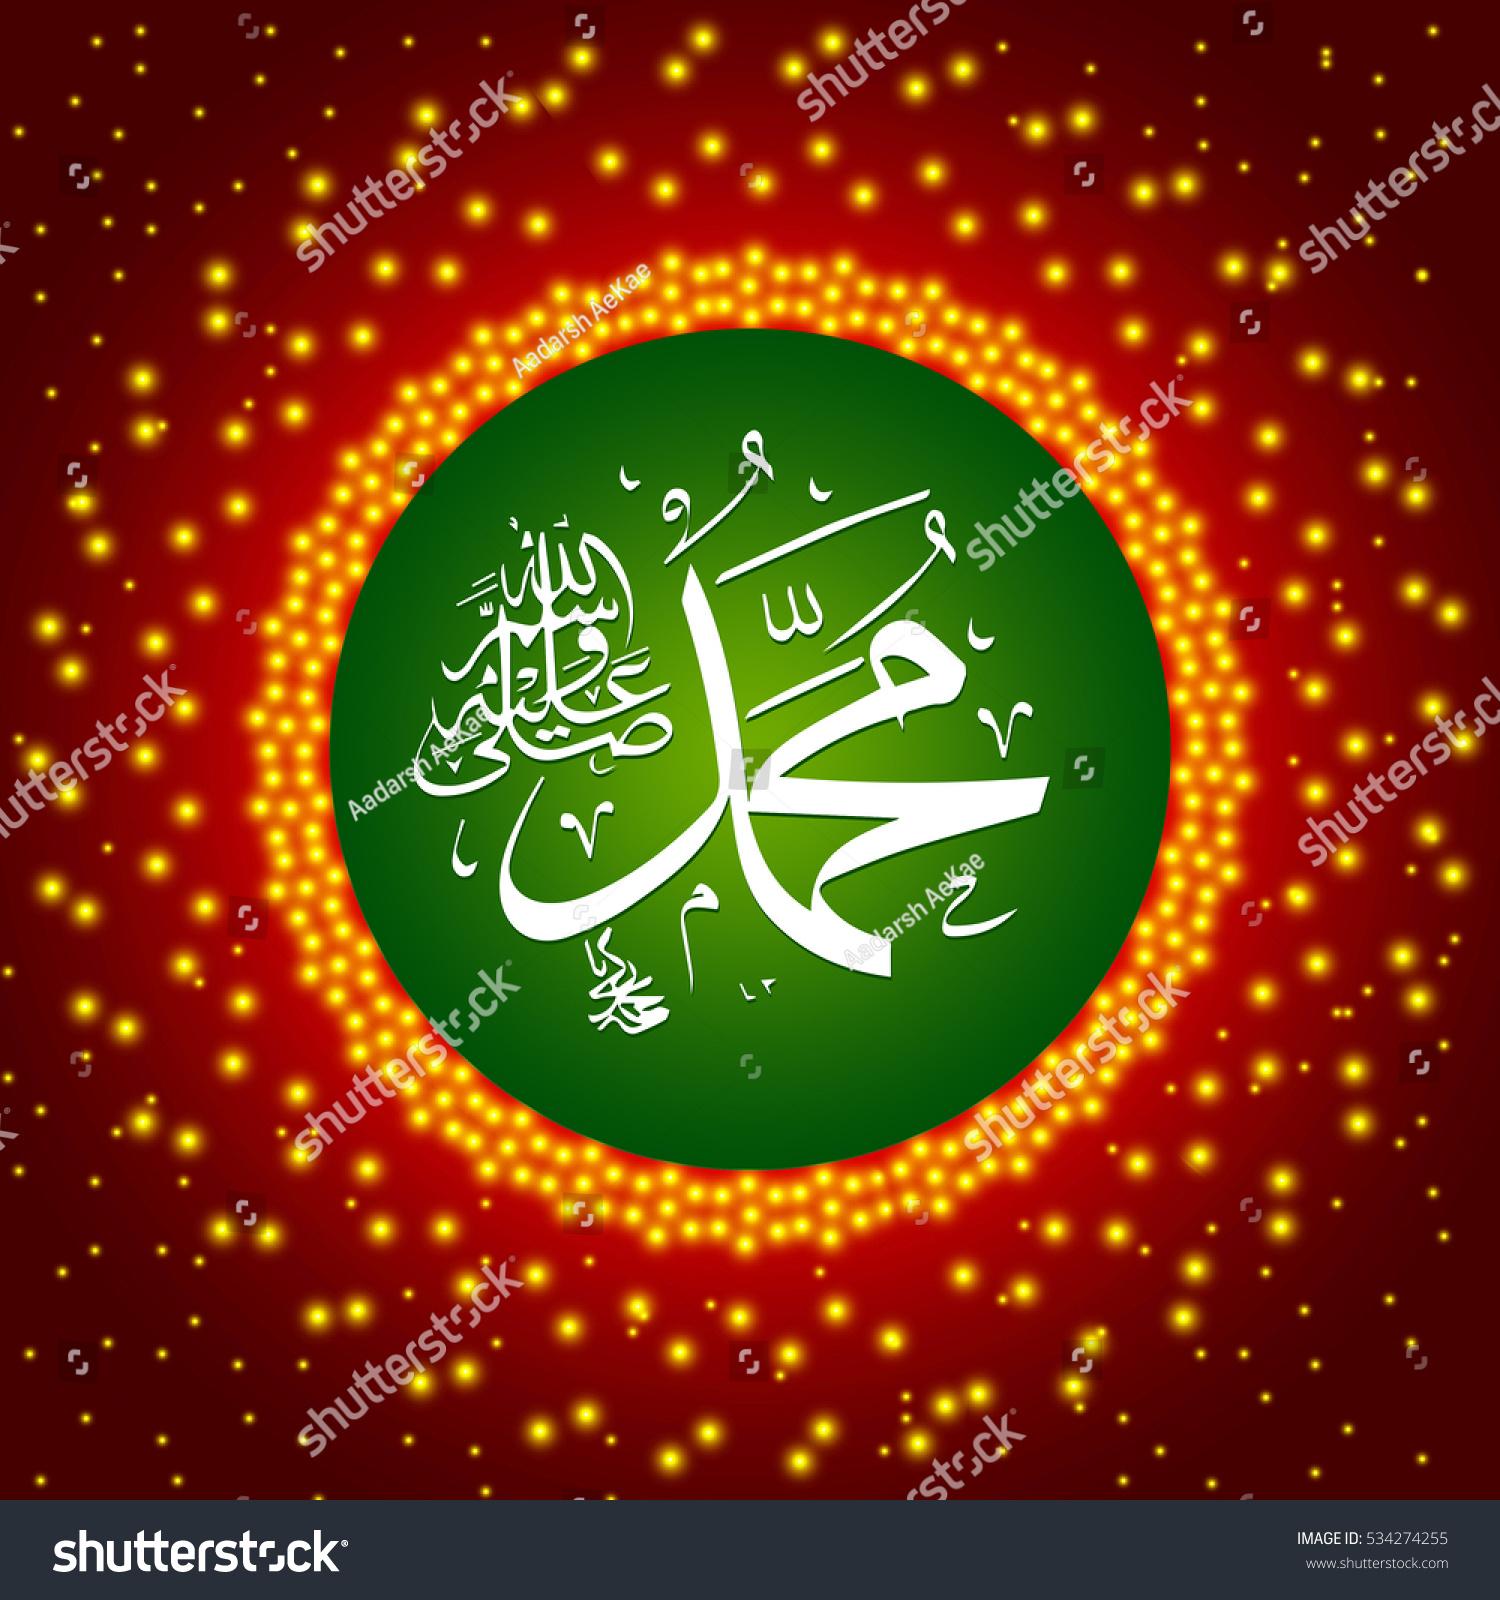 Mawlid al nabi prophet muhammads birthday stock illustration prophet muhammads birthday graphic design elements for decoration and gift cards m4hsunfo